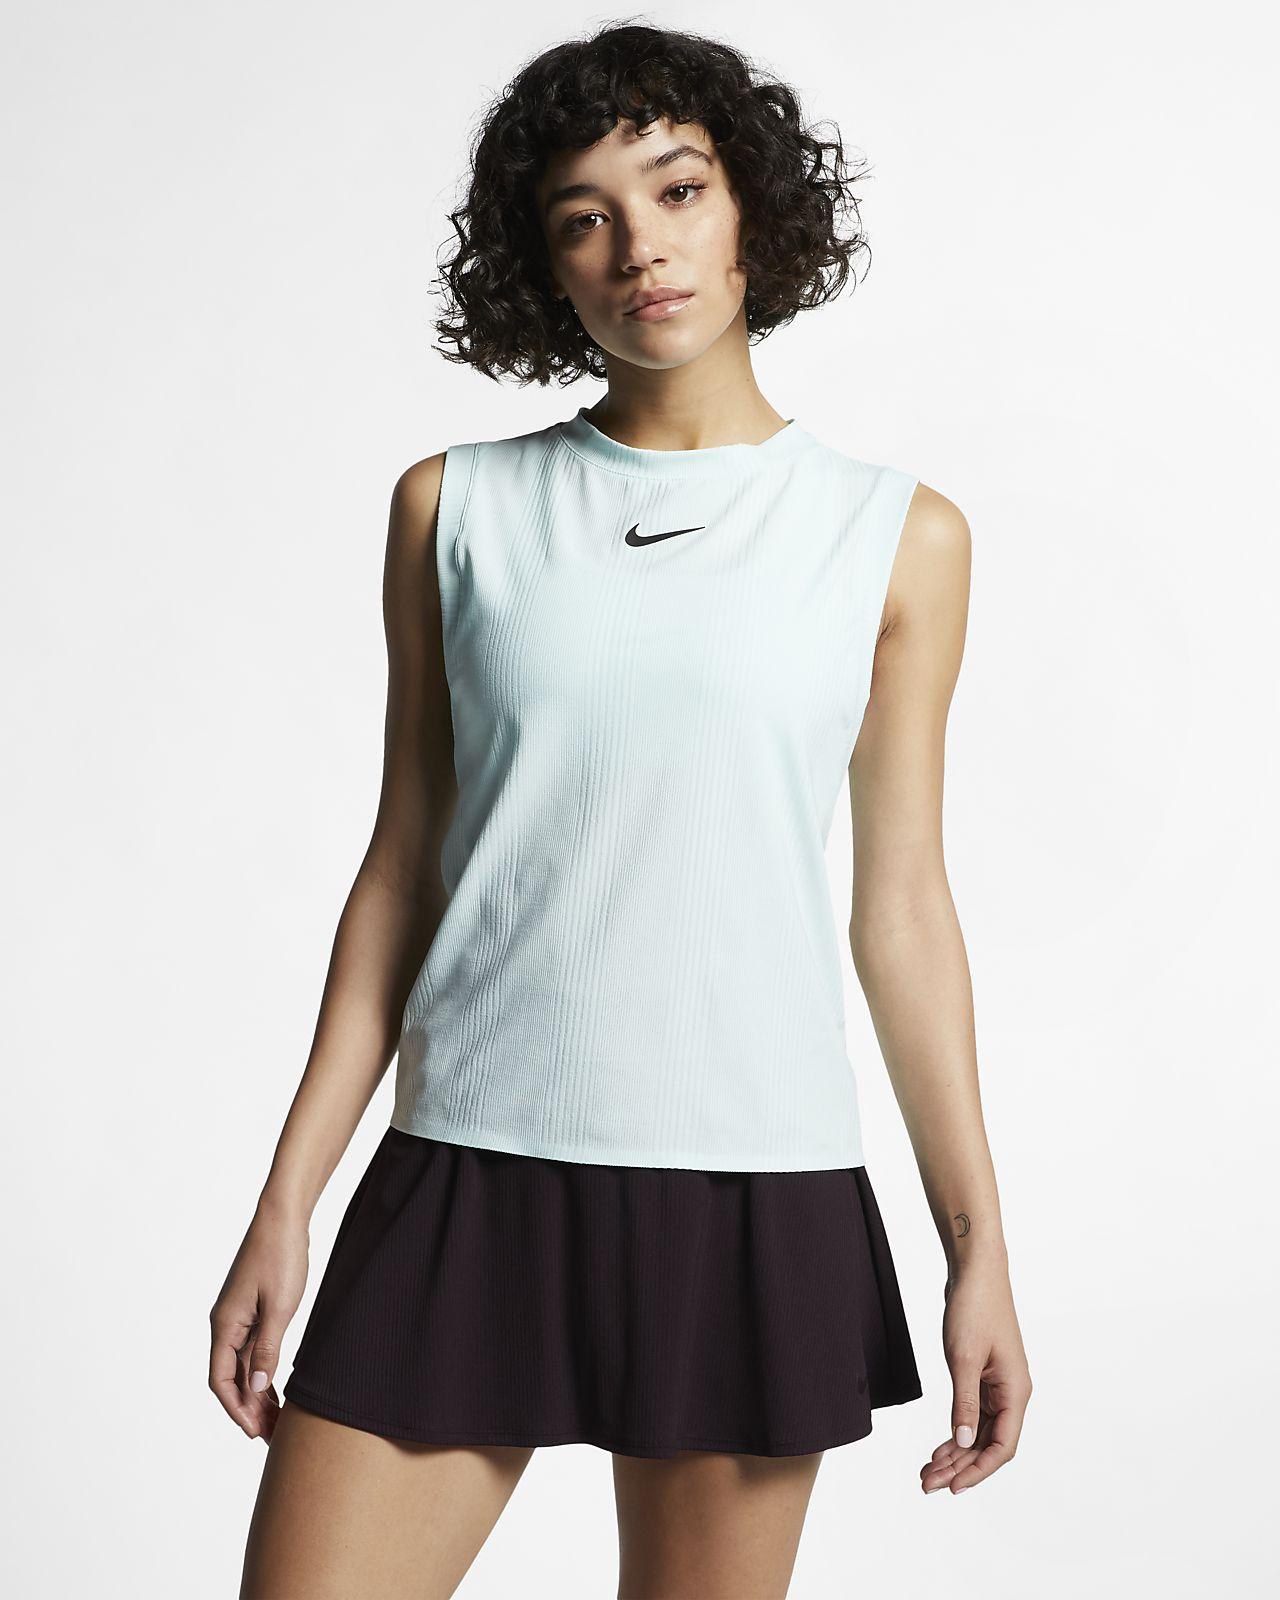 Camisola de ténis sem mangas NikeCourt Dri-FIT Maria para mulher